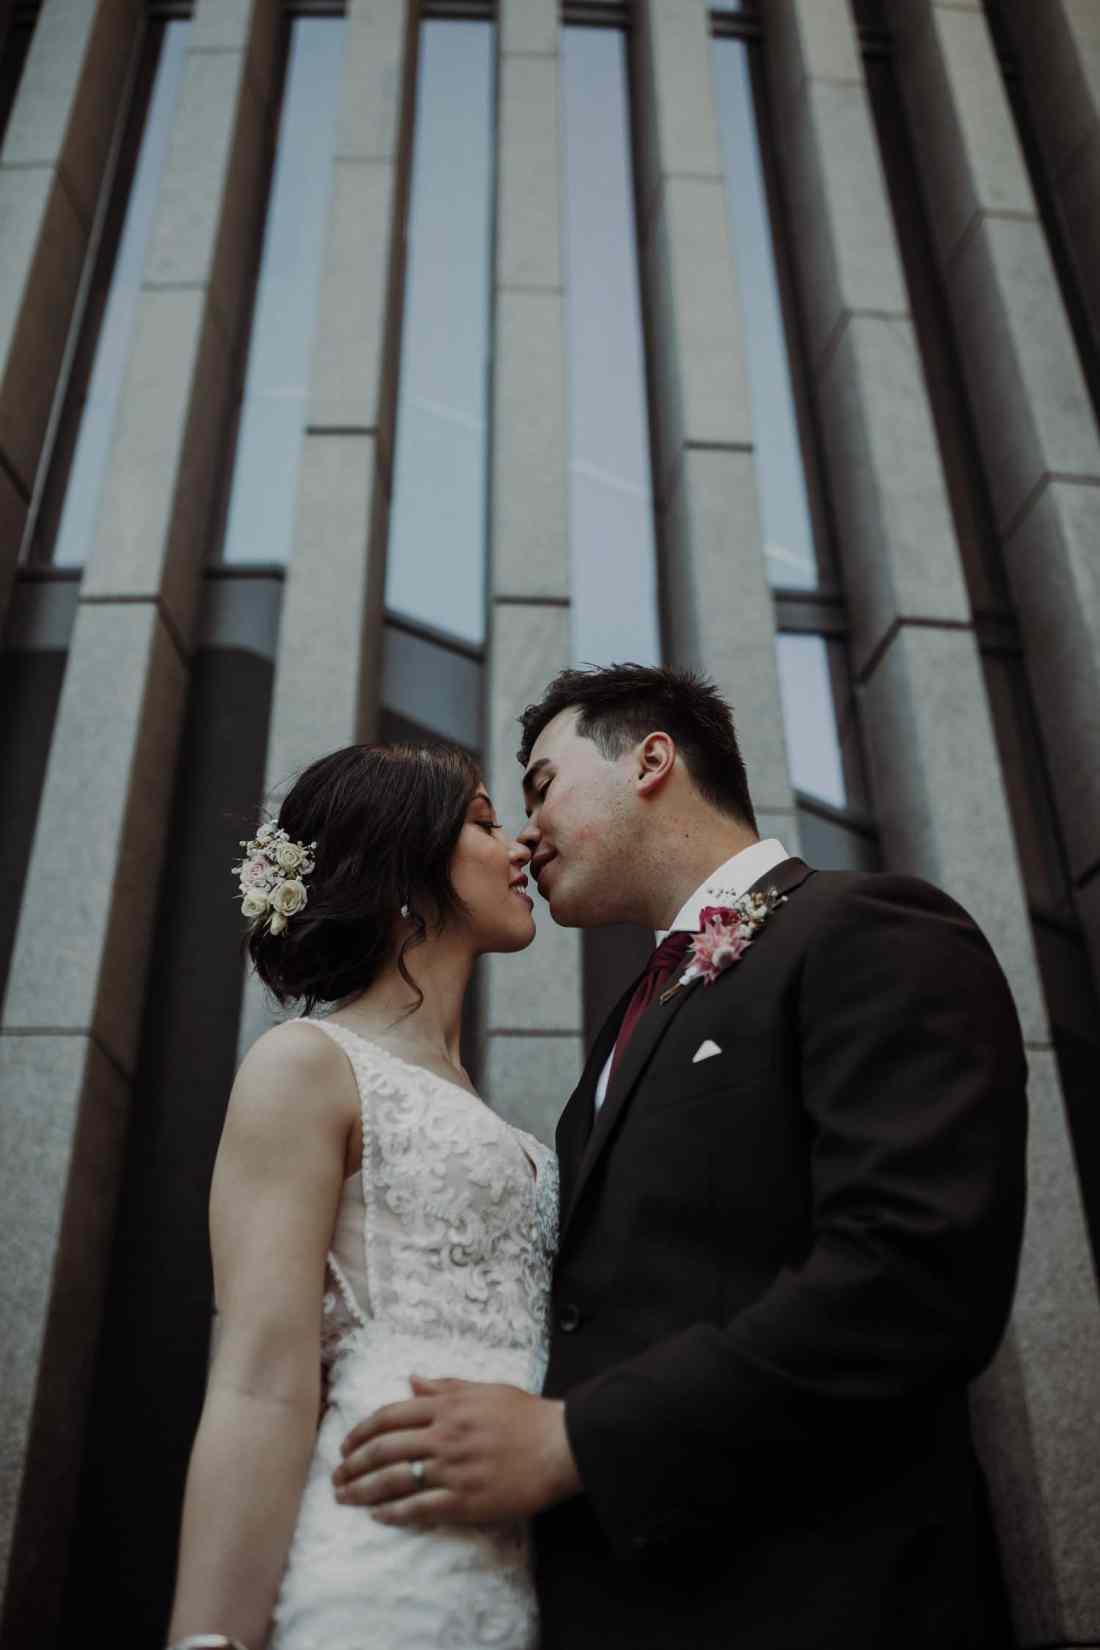 Ebony Blush Photography | Perth Wedding Photographer | Photography + Film | Sandalford Winery | Como Treasury Wedding | Perth City Wedding |Alex + Mel70